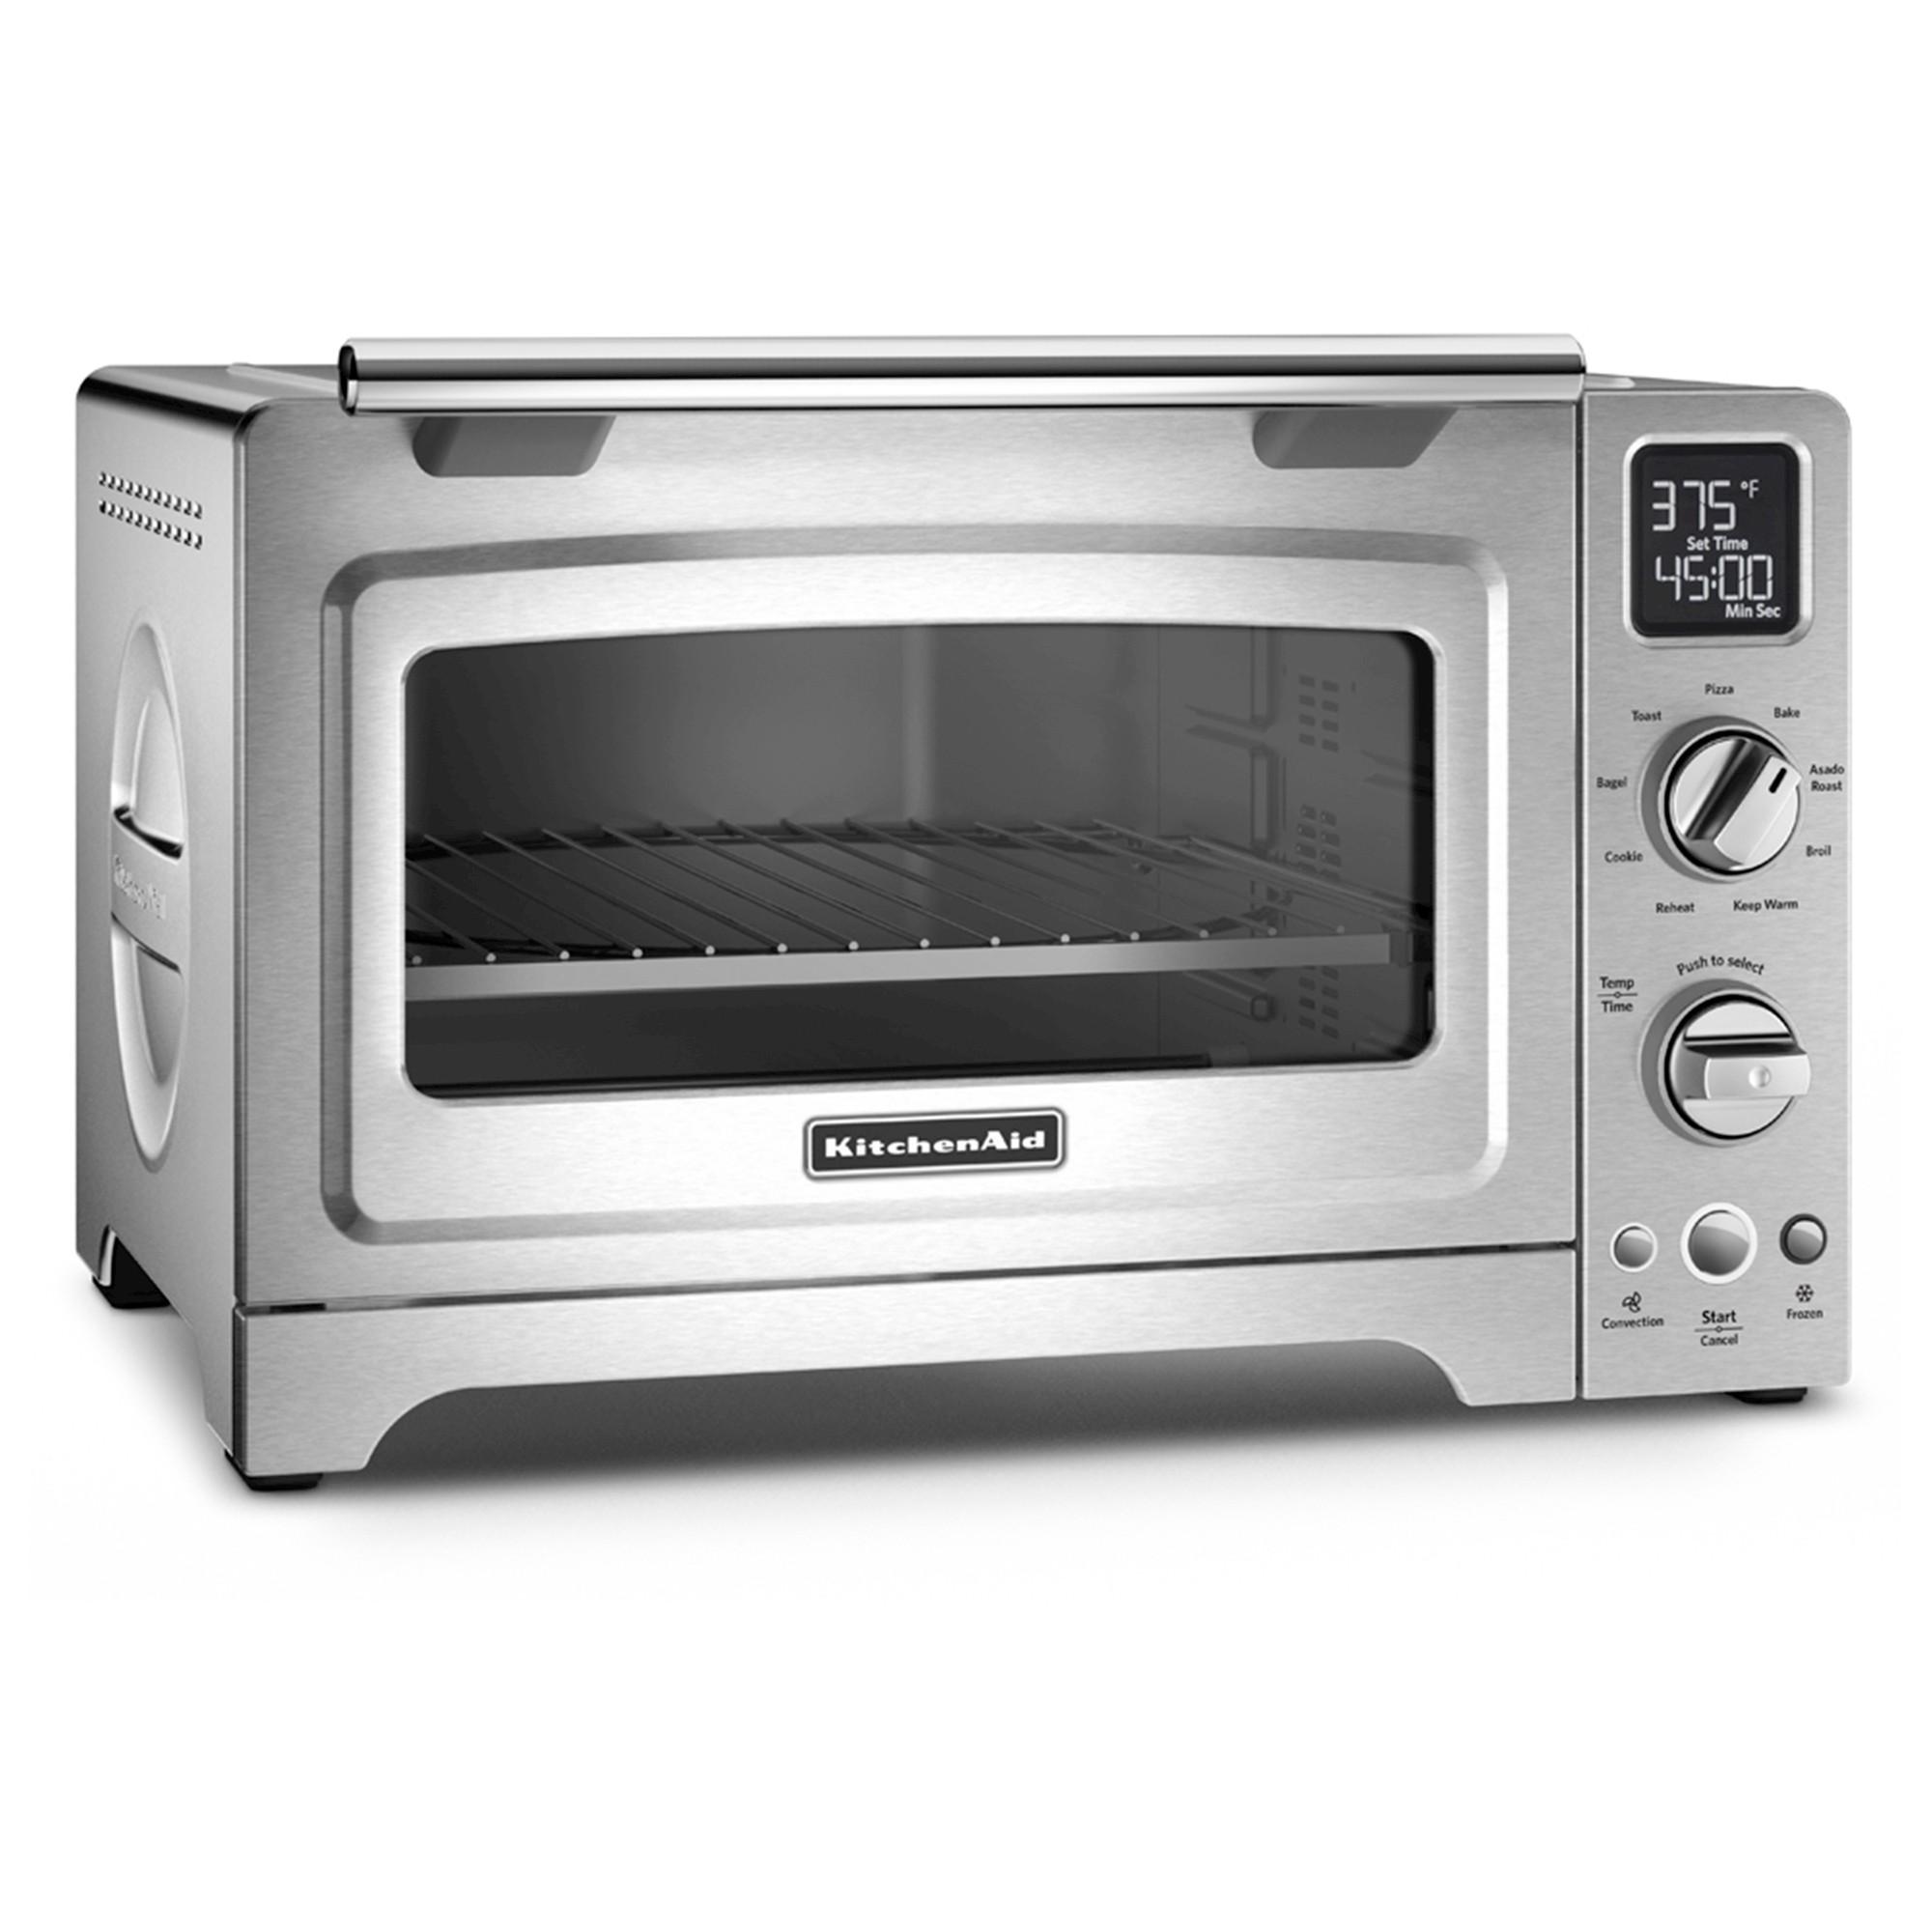 Kitchenaid 12 Convection Digital Countertop Oven Kco275 Silver Countertop Oven Convection Toaster Oven Countertop Convection Oven